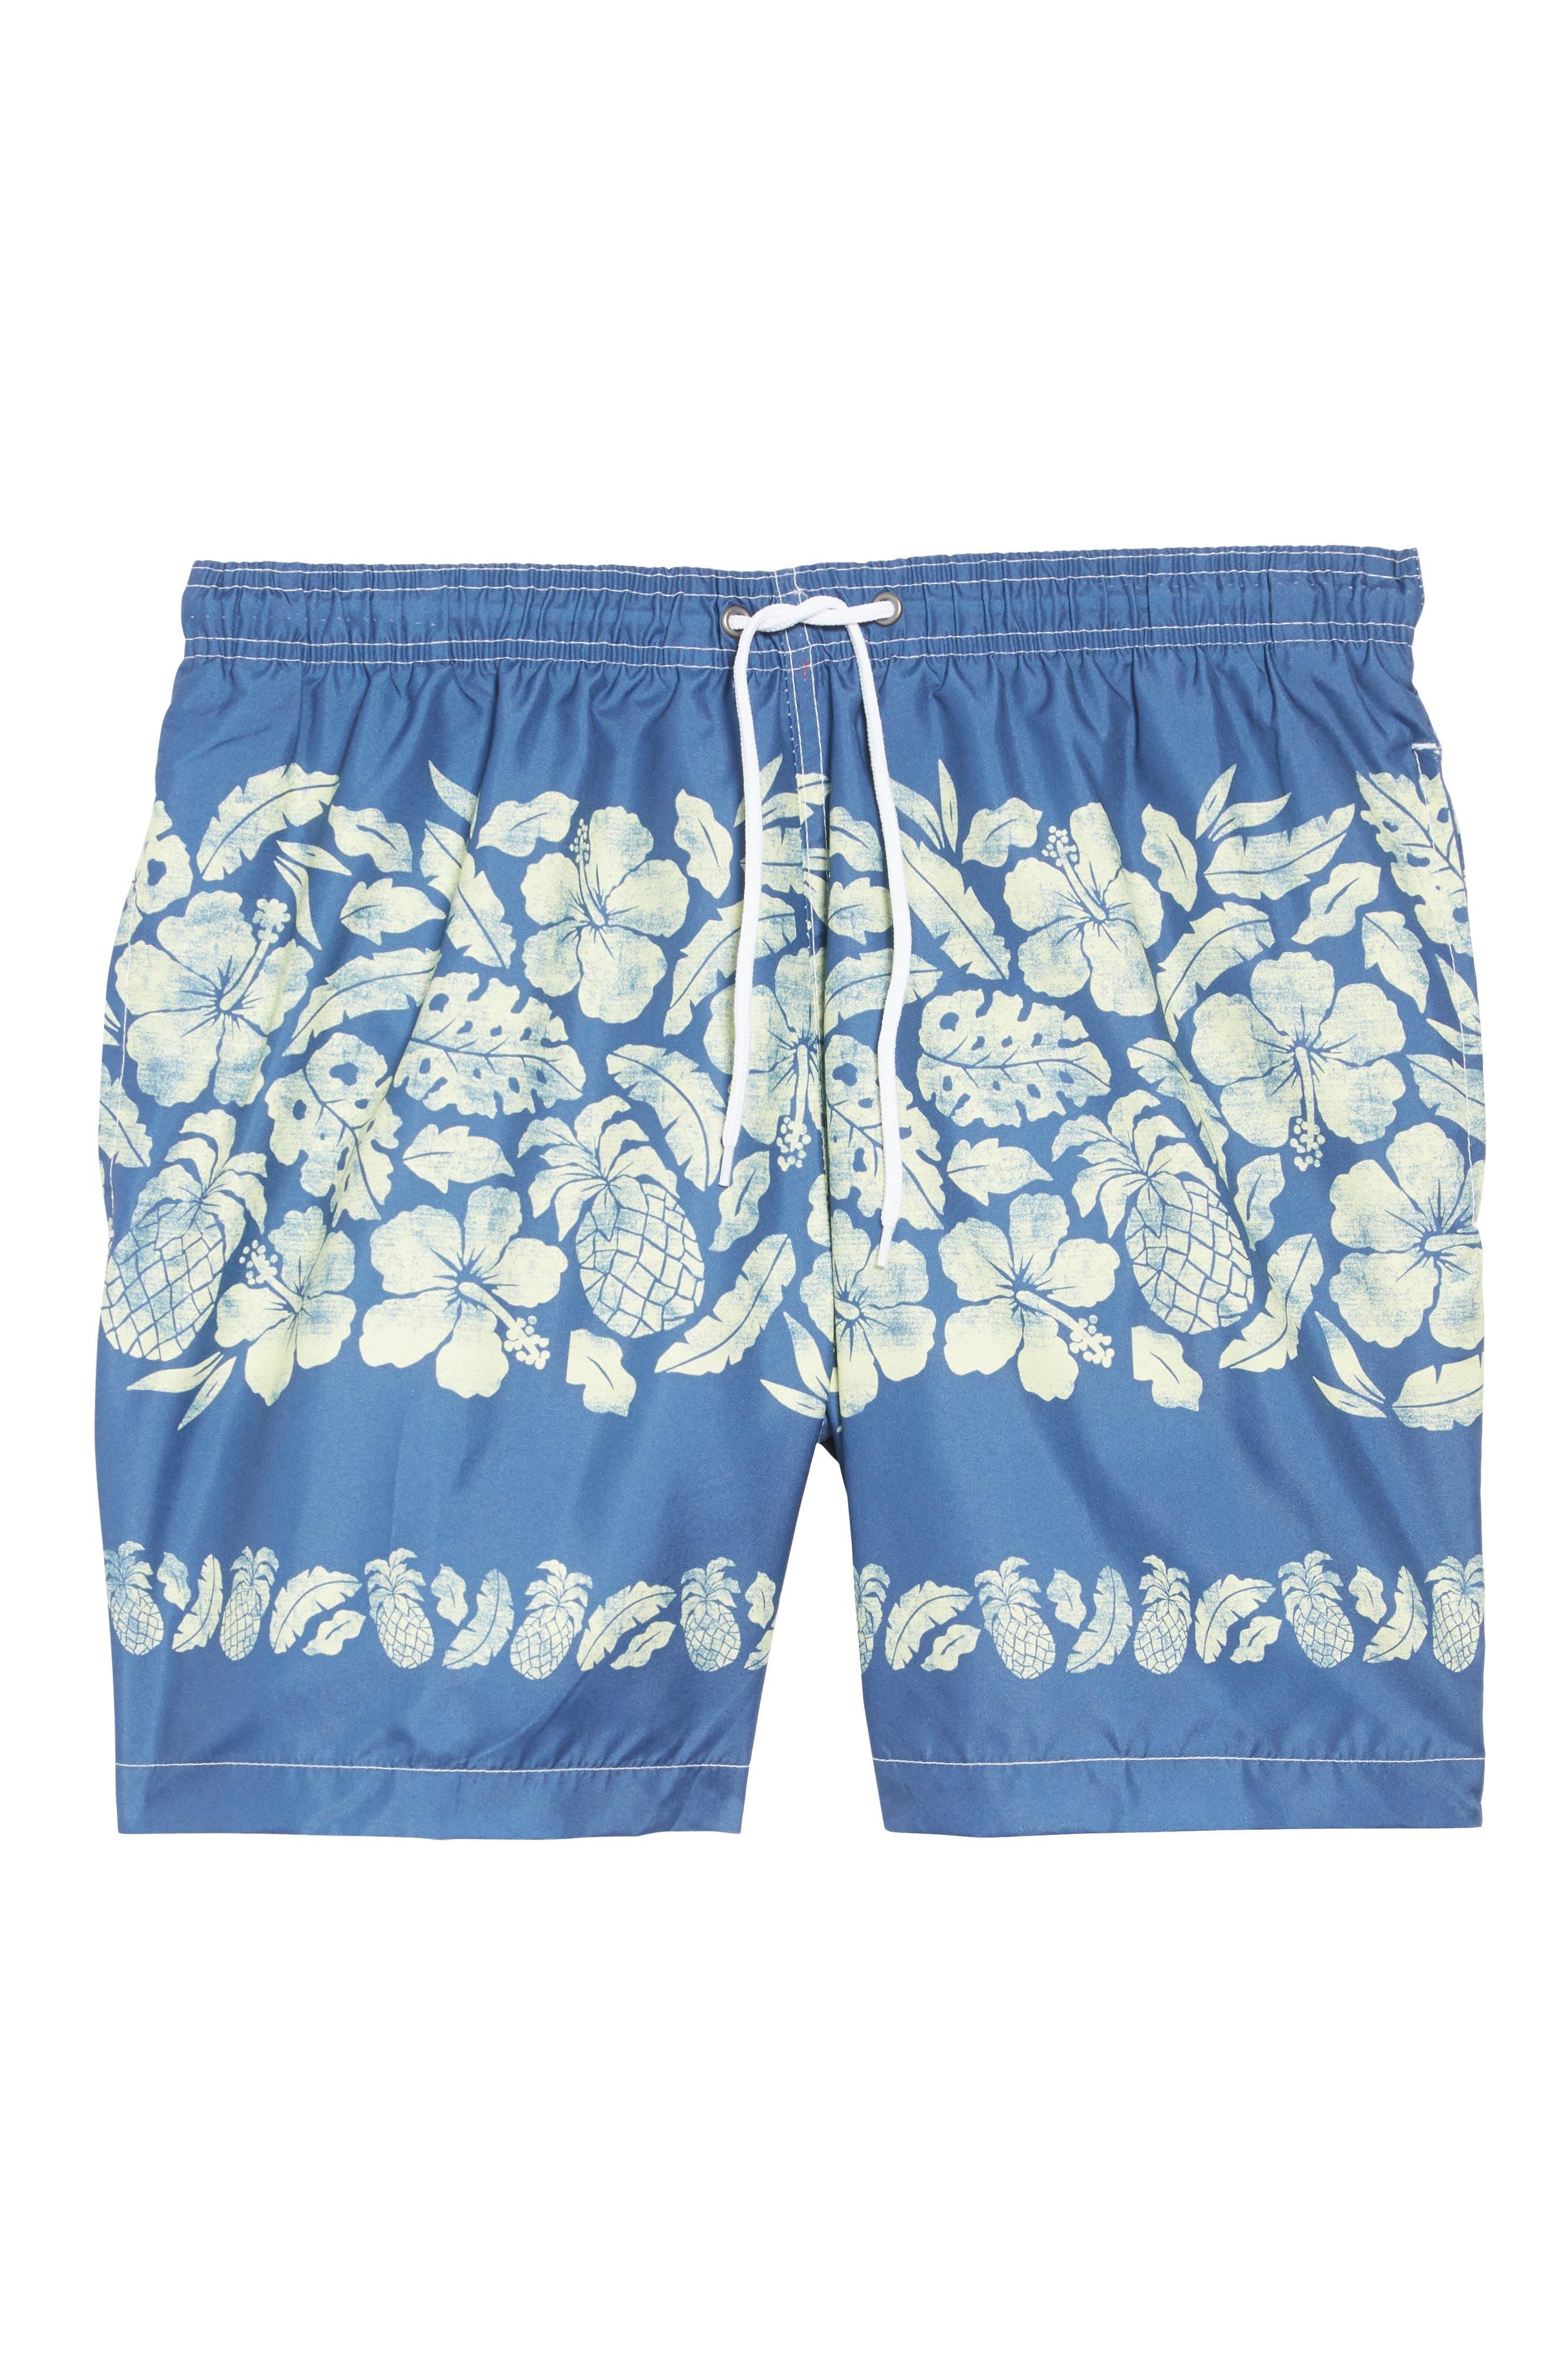 Placement Print Sano Swim Shorts,                             Alternate thumbnail 6, color,                             PINEAPPLE BORDER